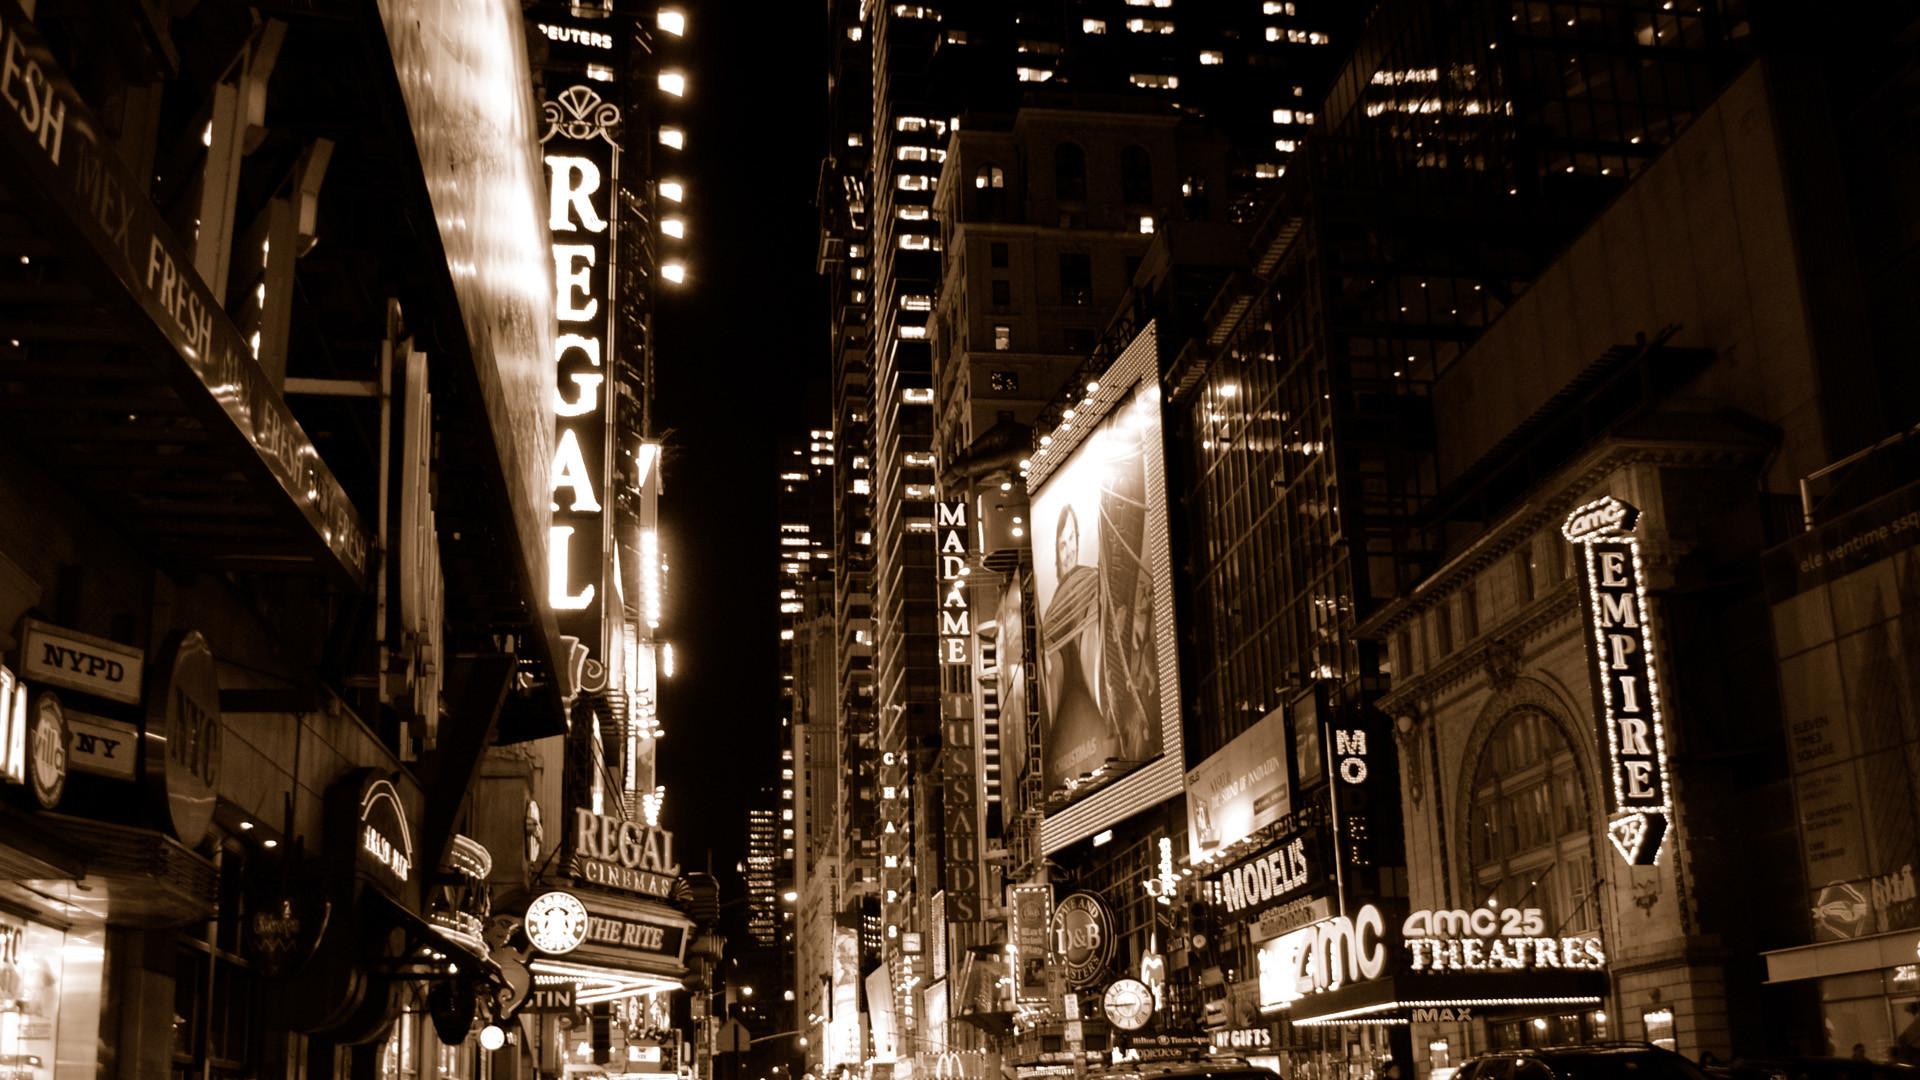 Wall Street New York | Wallpapers Wall Street Related | #610595 #wall  street